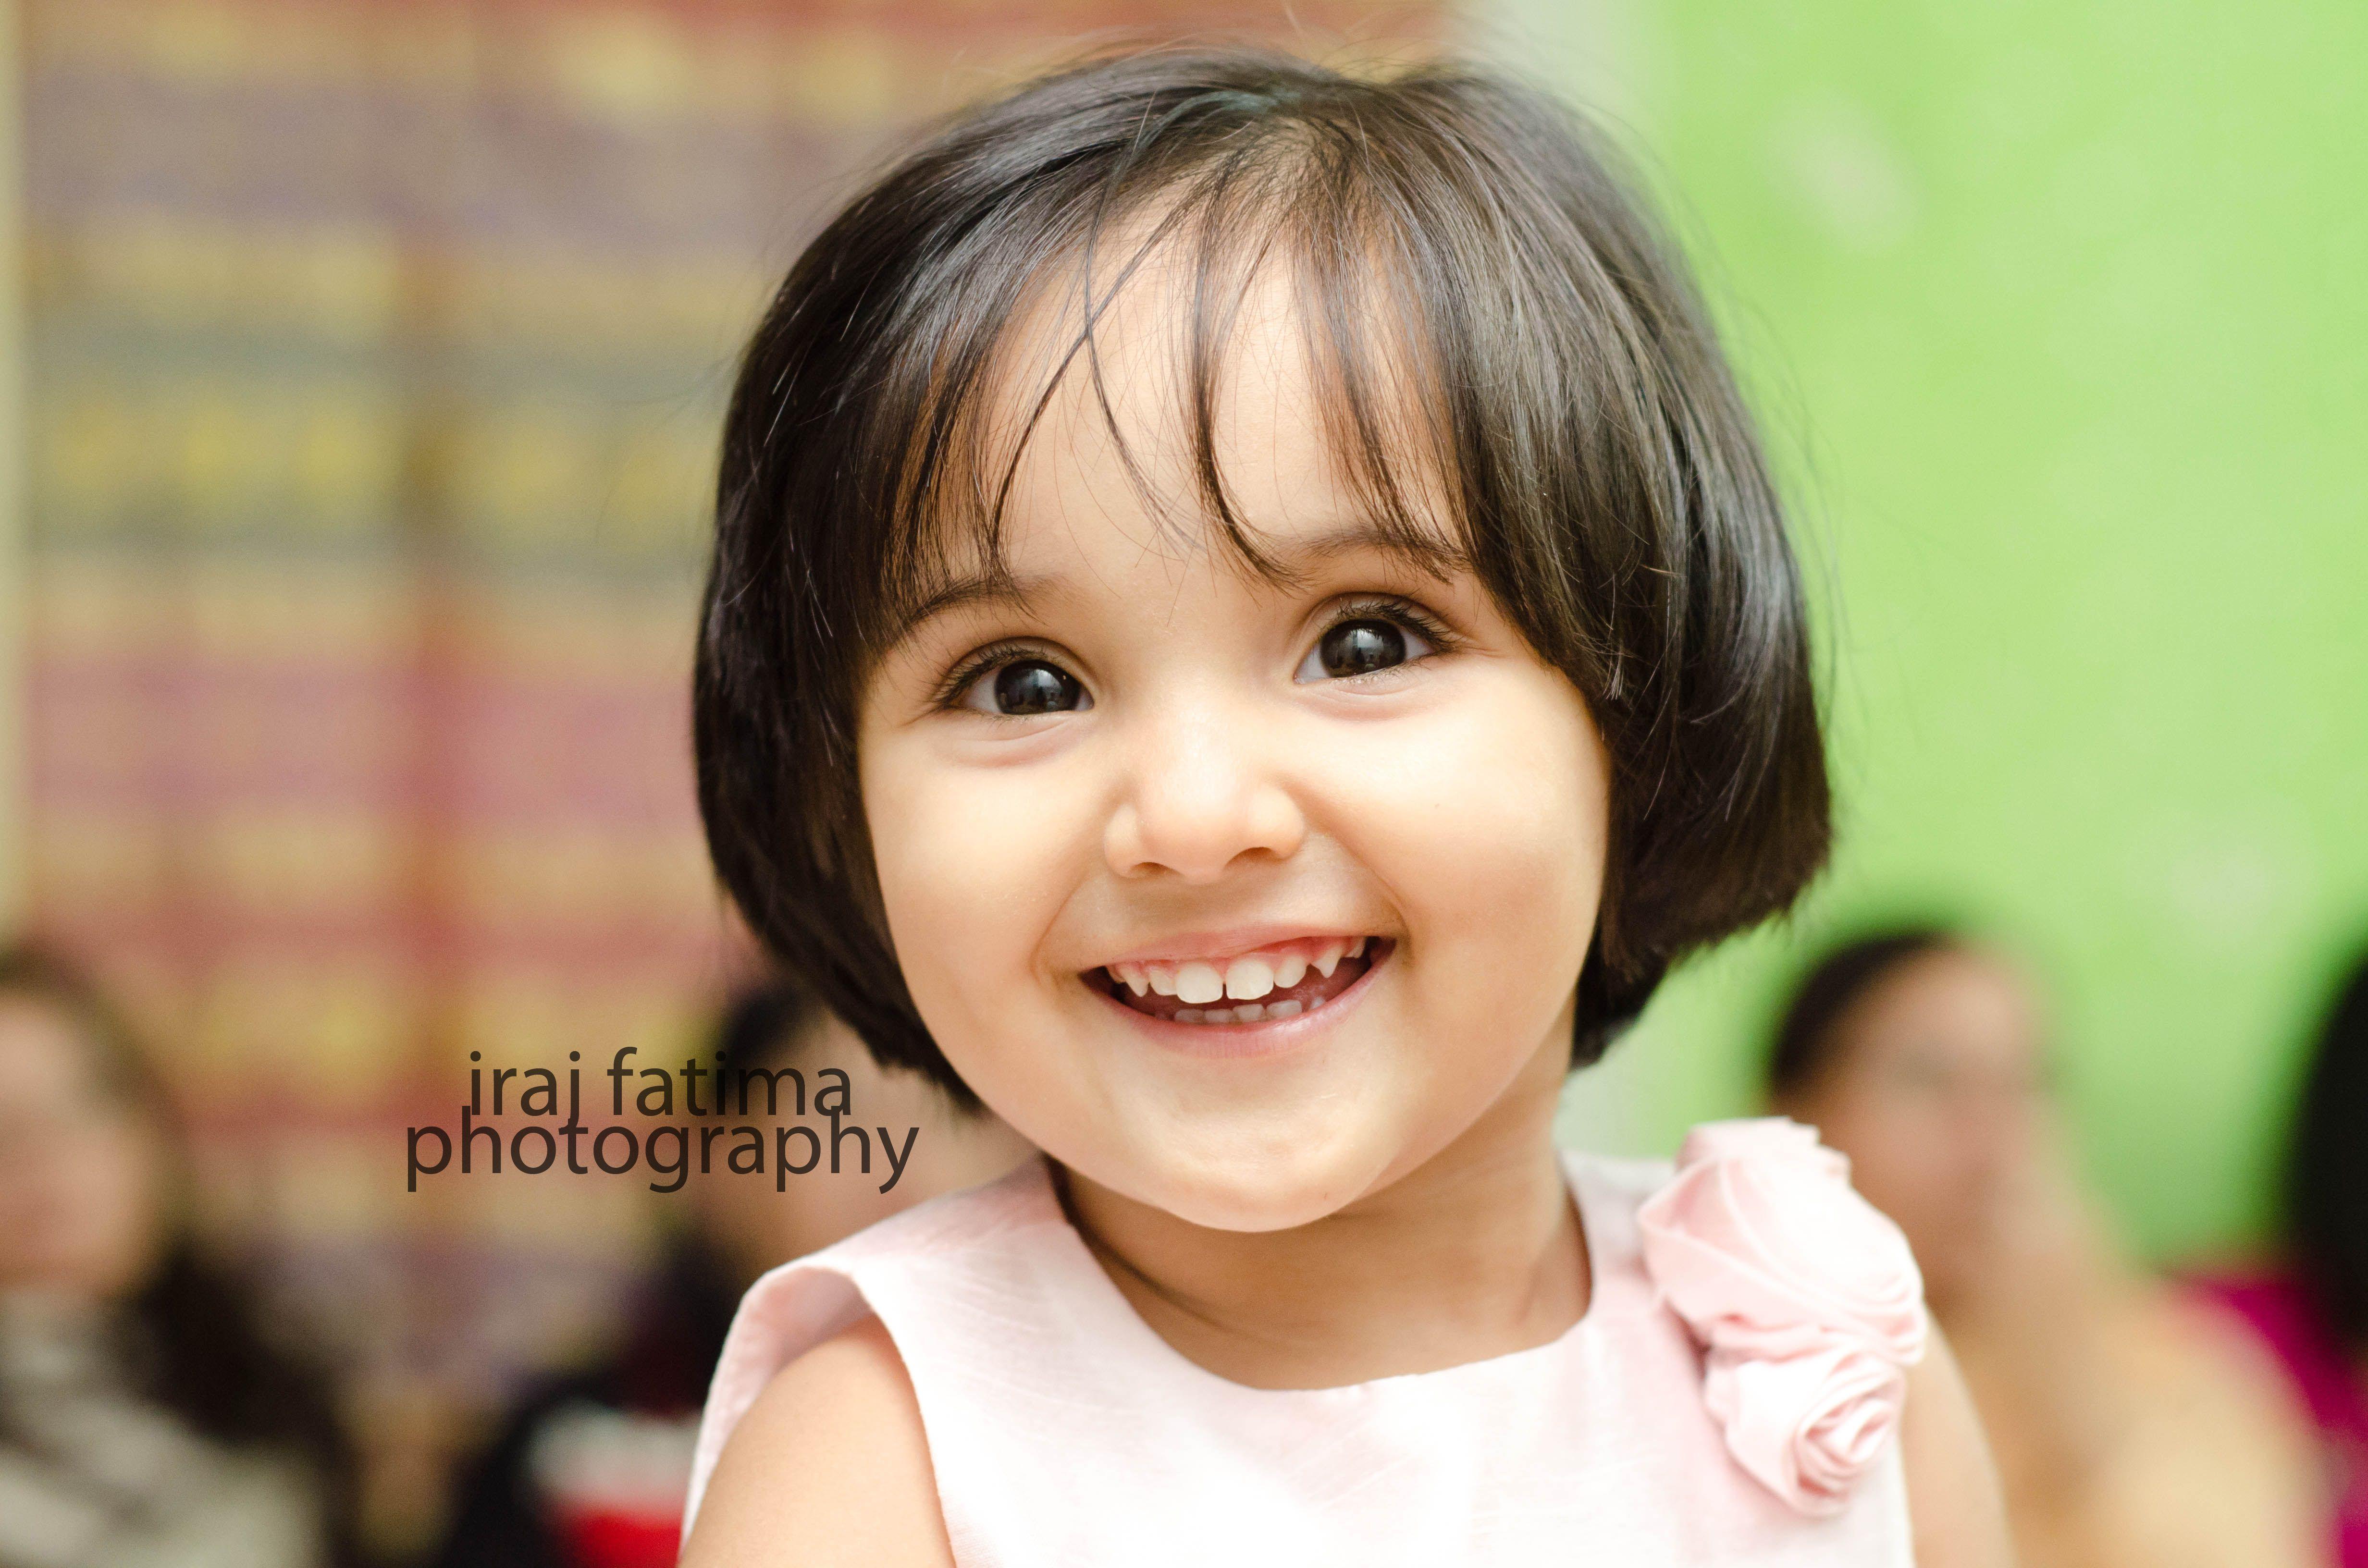 cute kid! | Iraj Fatima Photography | Pinterest | Girls rules